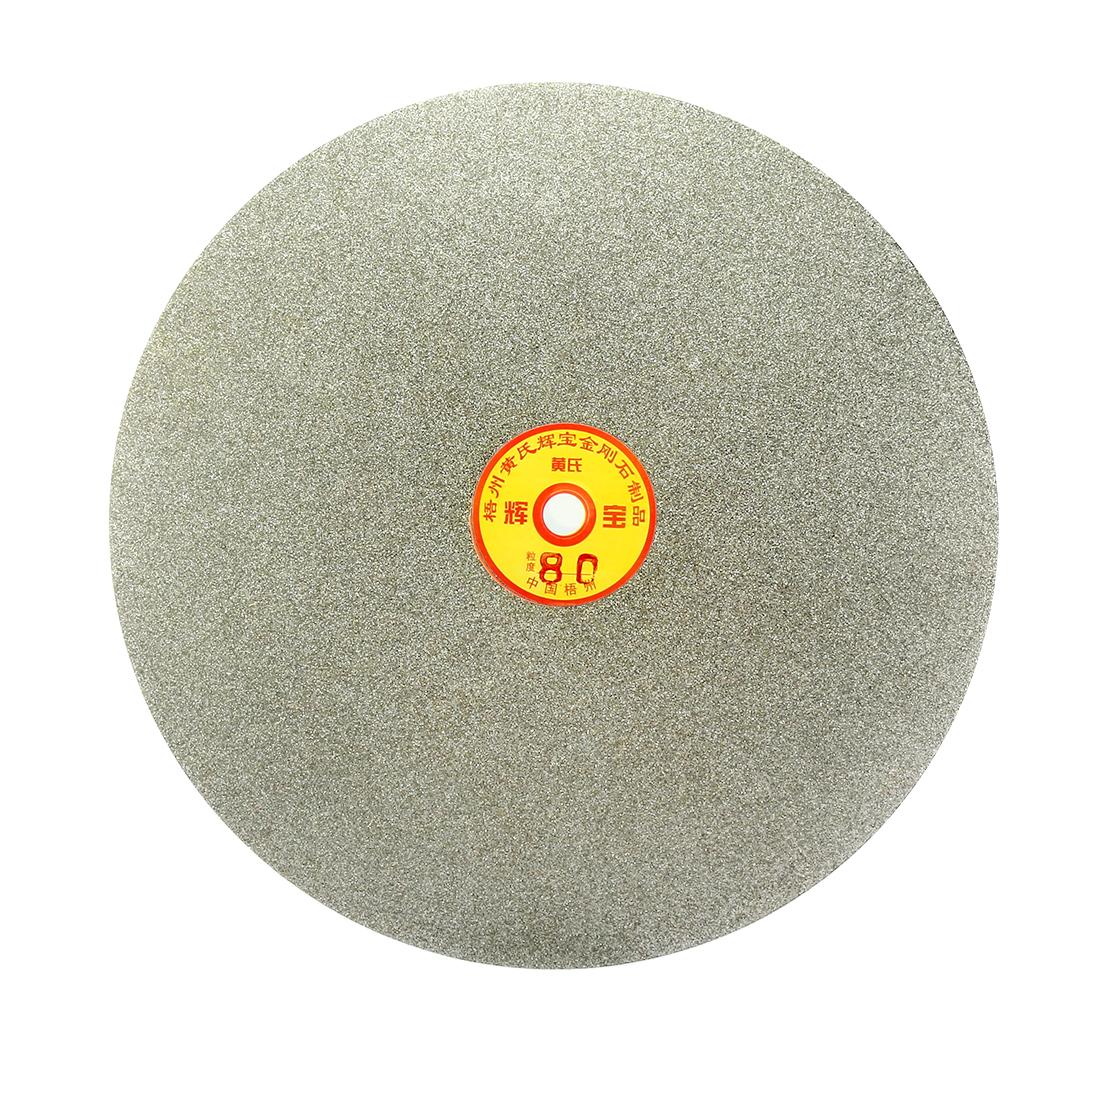 250mm 10-inch Grit 80 Diamond Coated Flat Lap Disk Wheel Grinding Sanding Disc